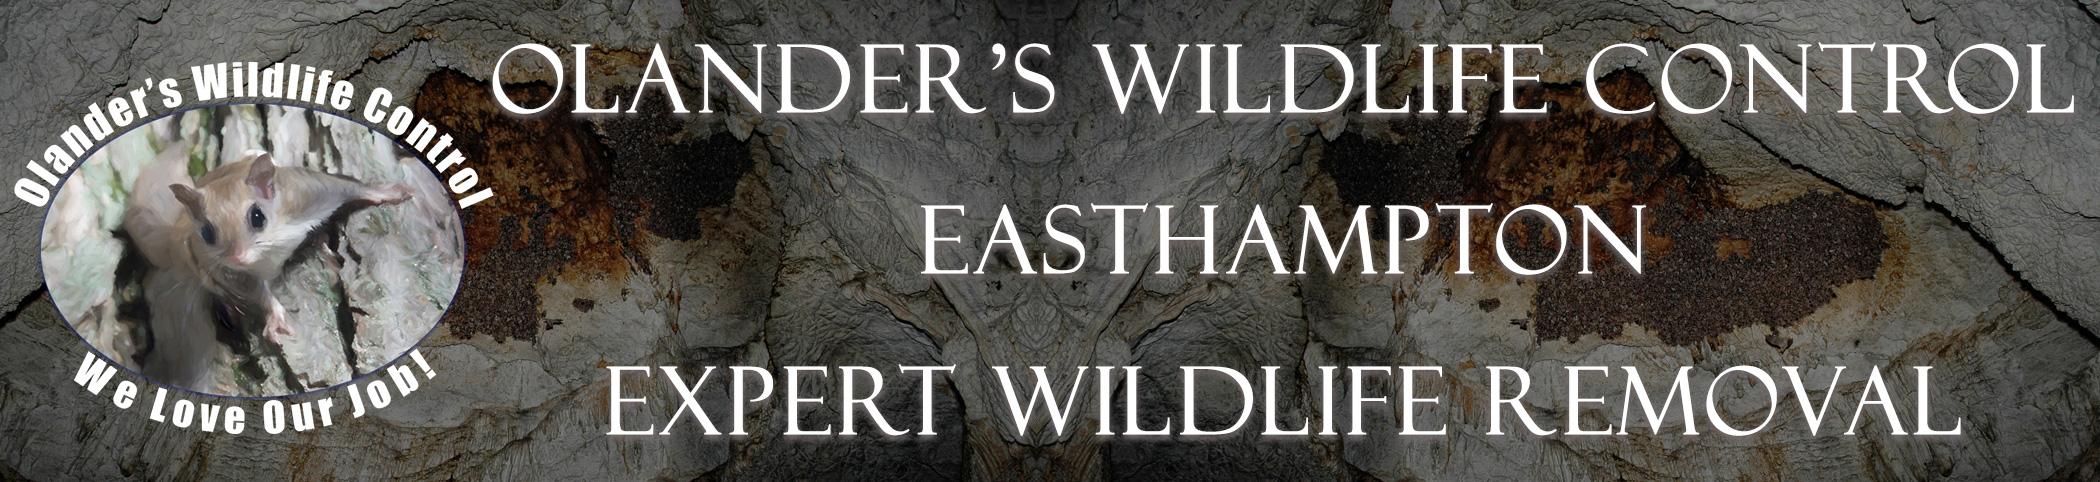 olanders-wildlife-control-easthampton-mass-header-image